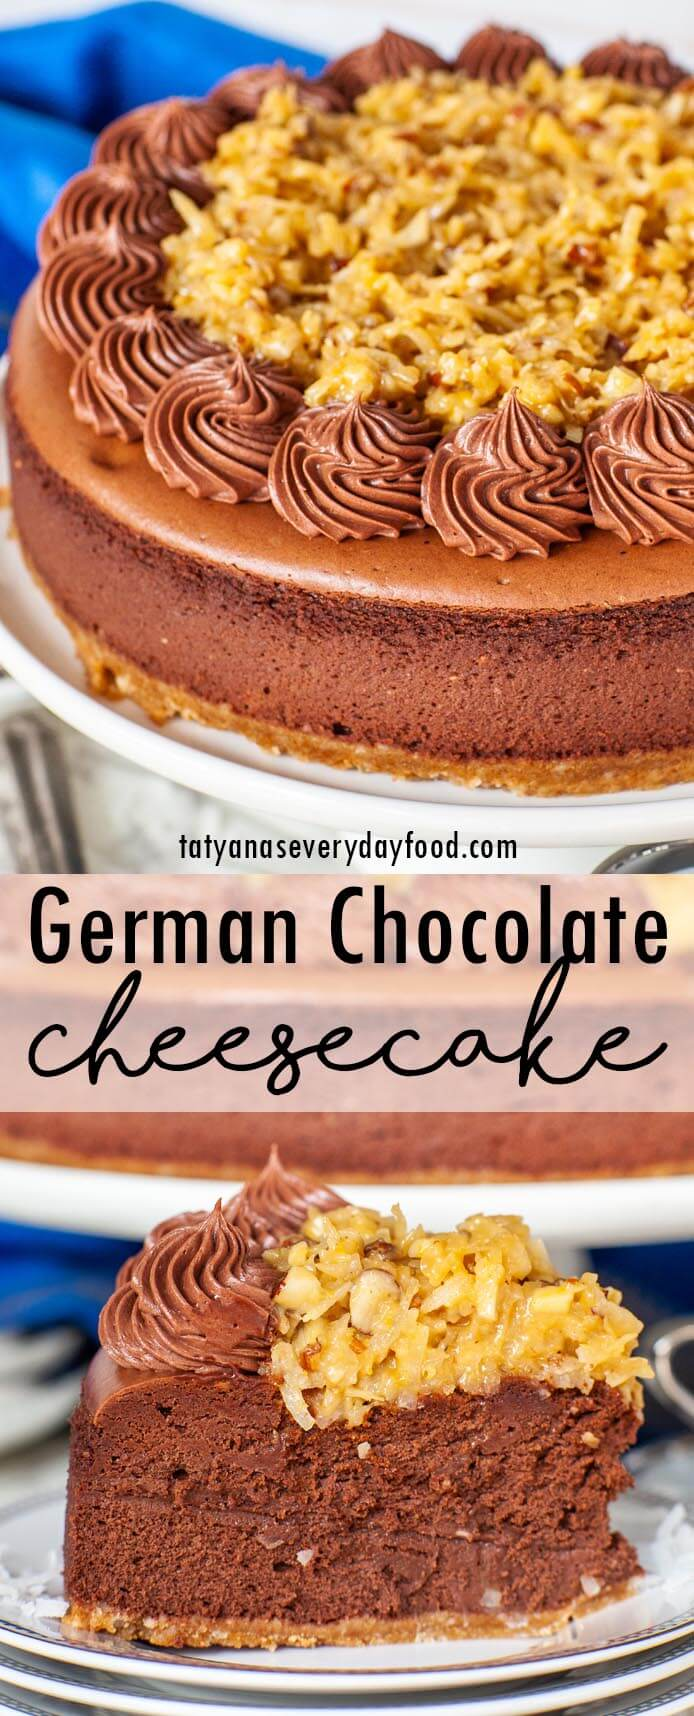 German Chocolate Cheesecake video recipe